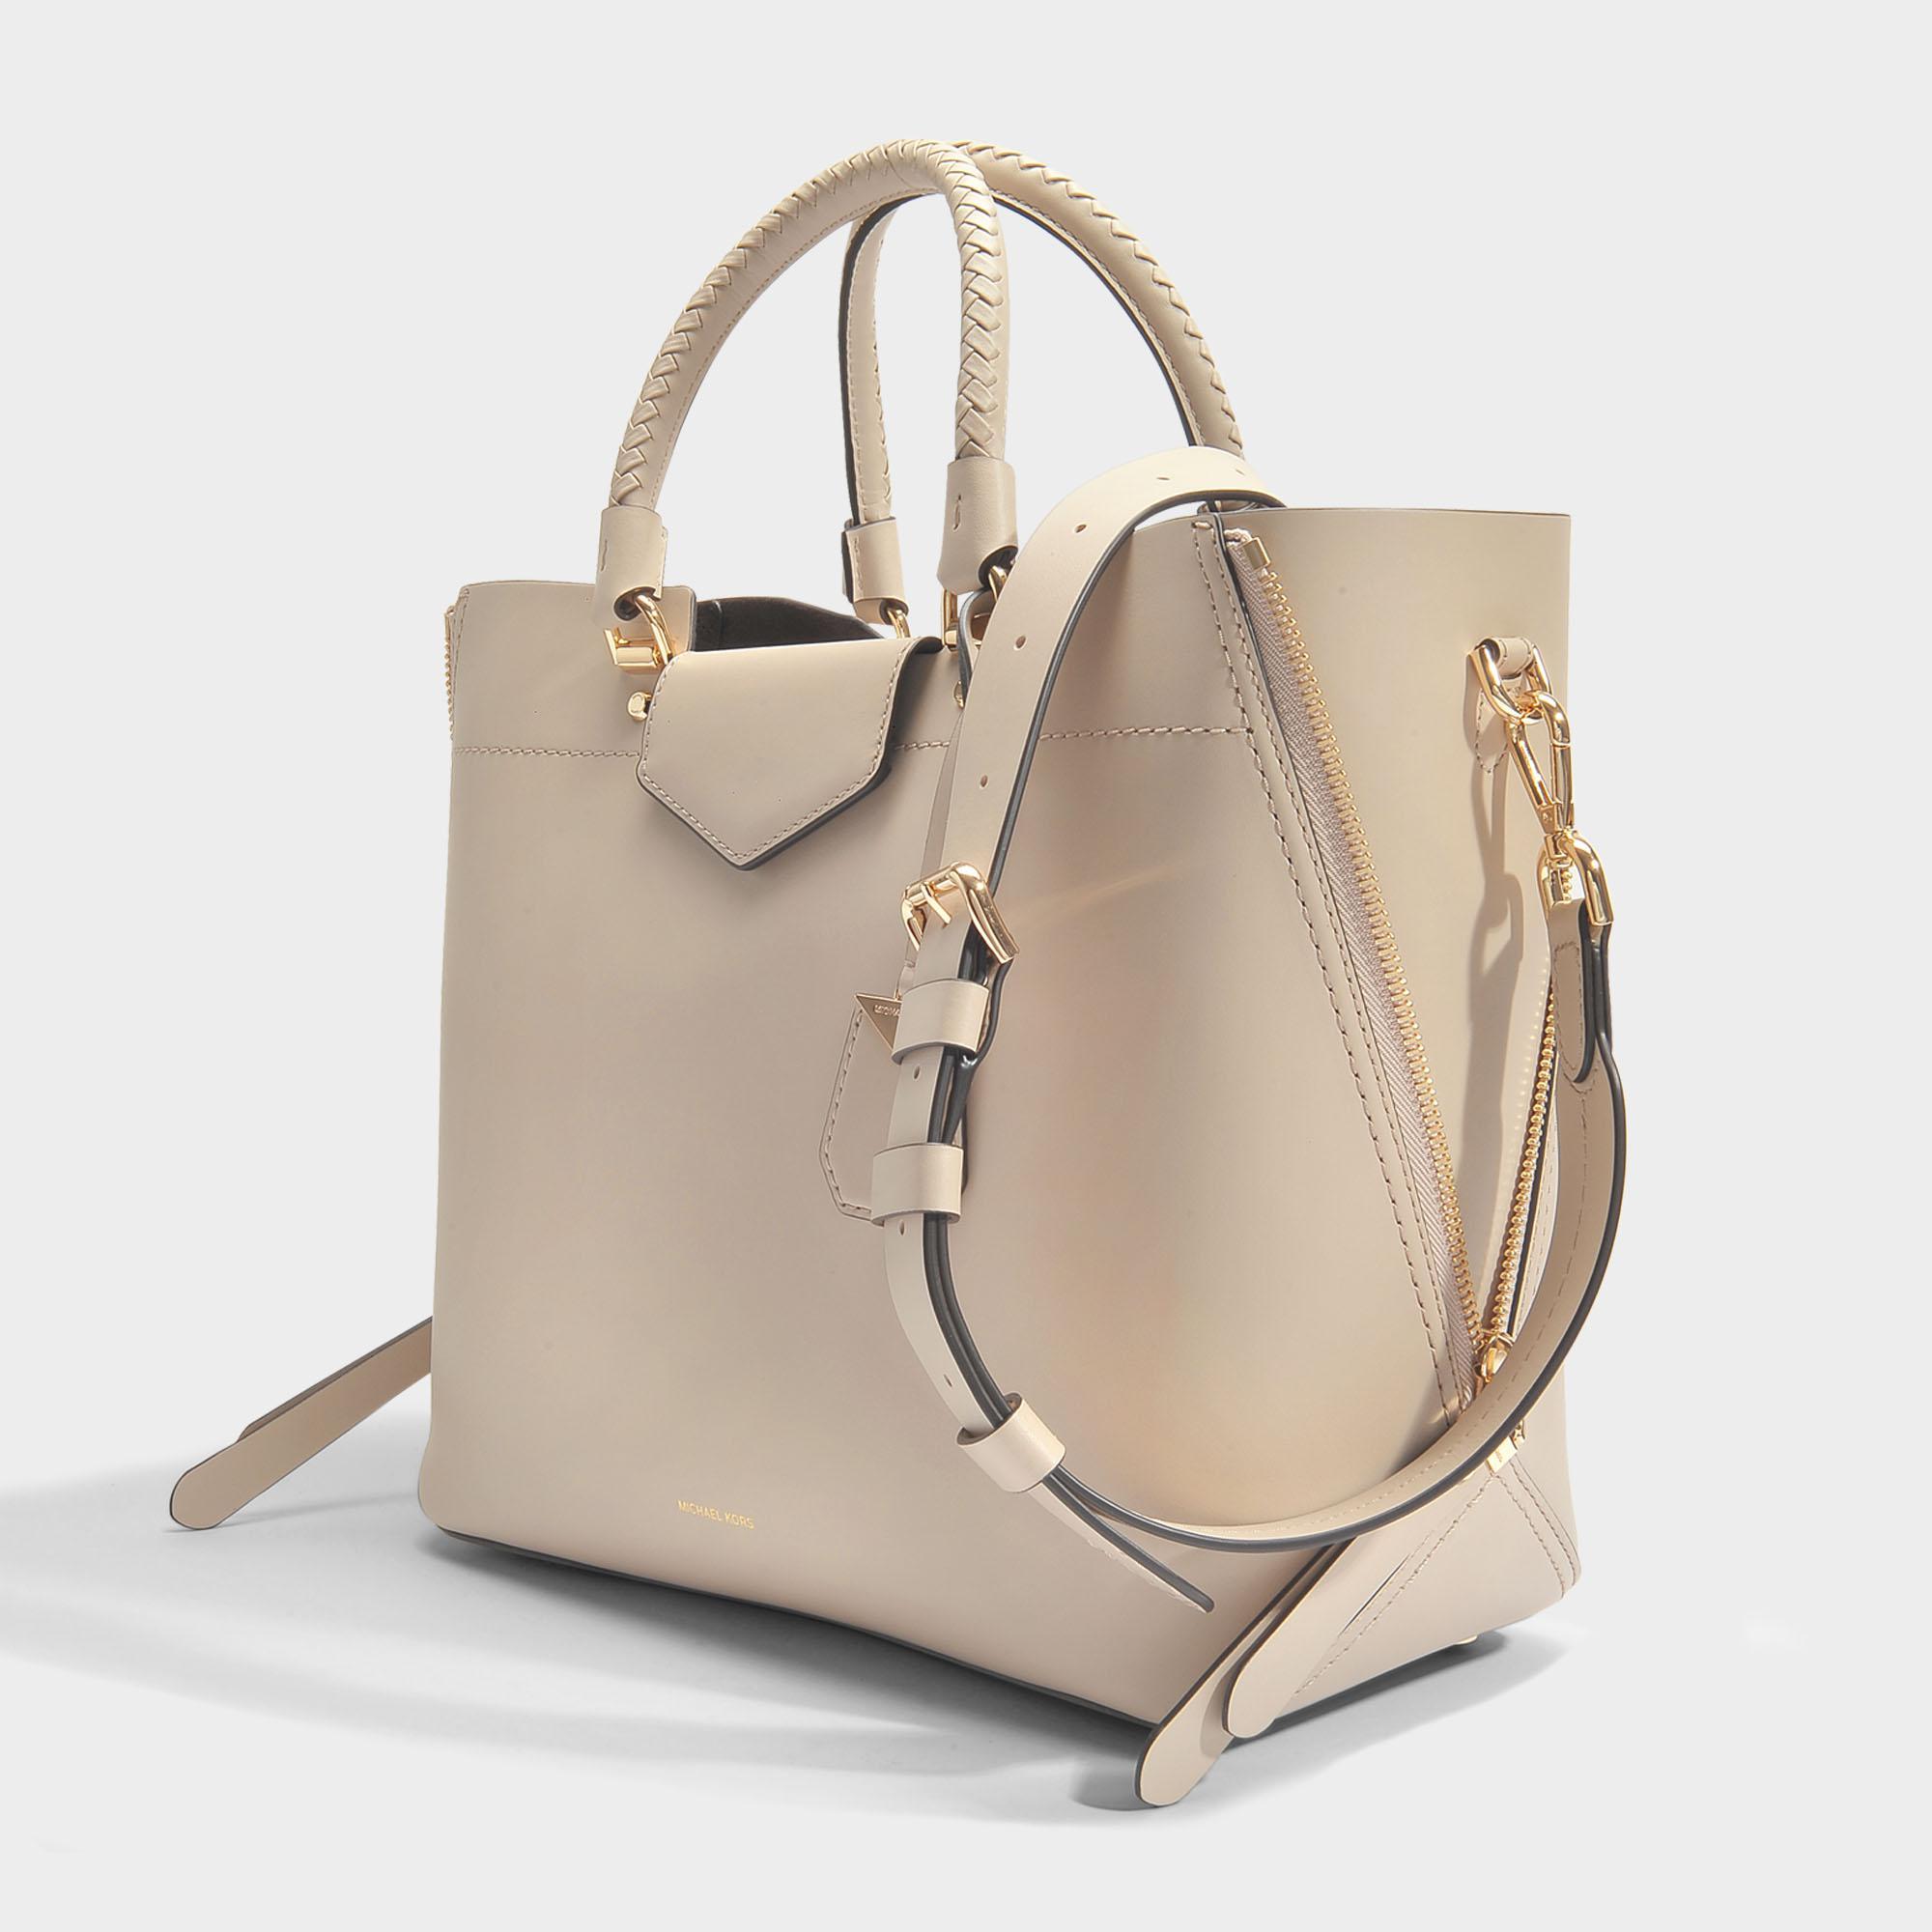 7699255aaa71 MICHAEL Michael Kors Blakely Large Tote Bag In Oat Viola Leather - Lyst